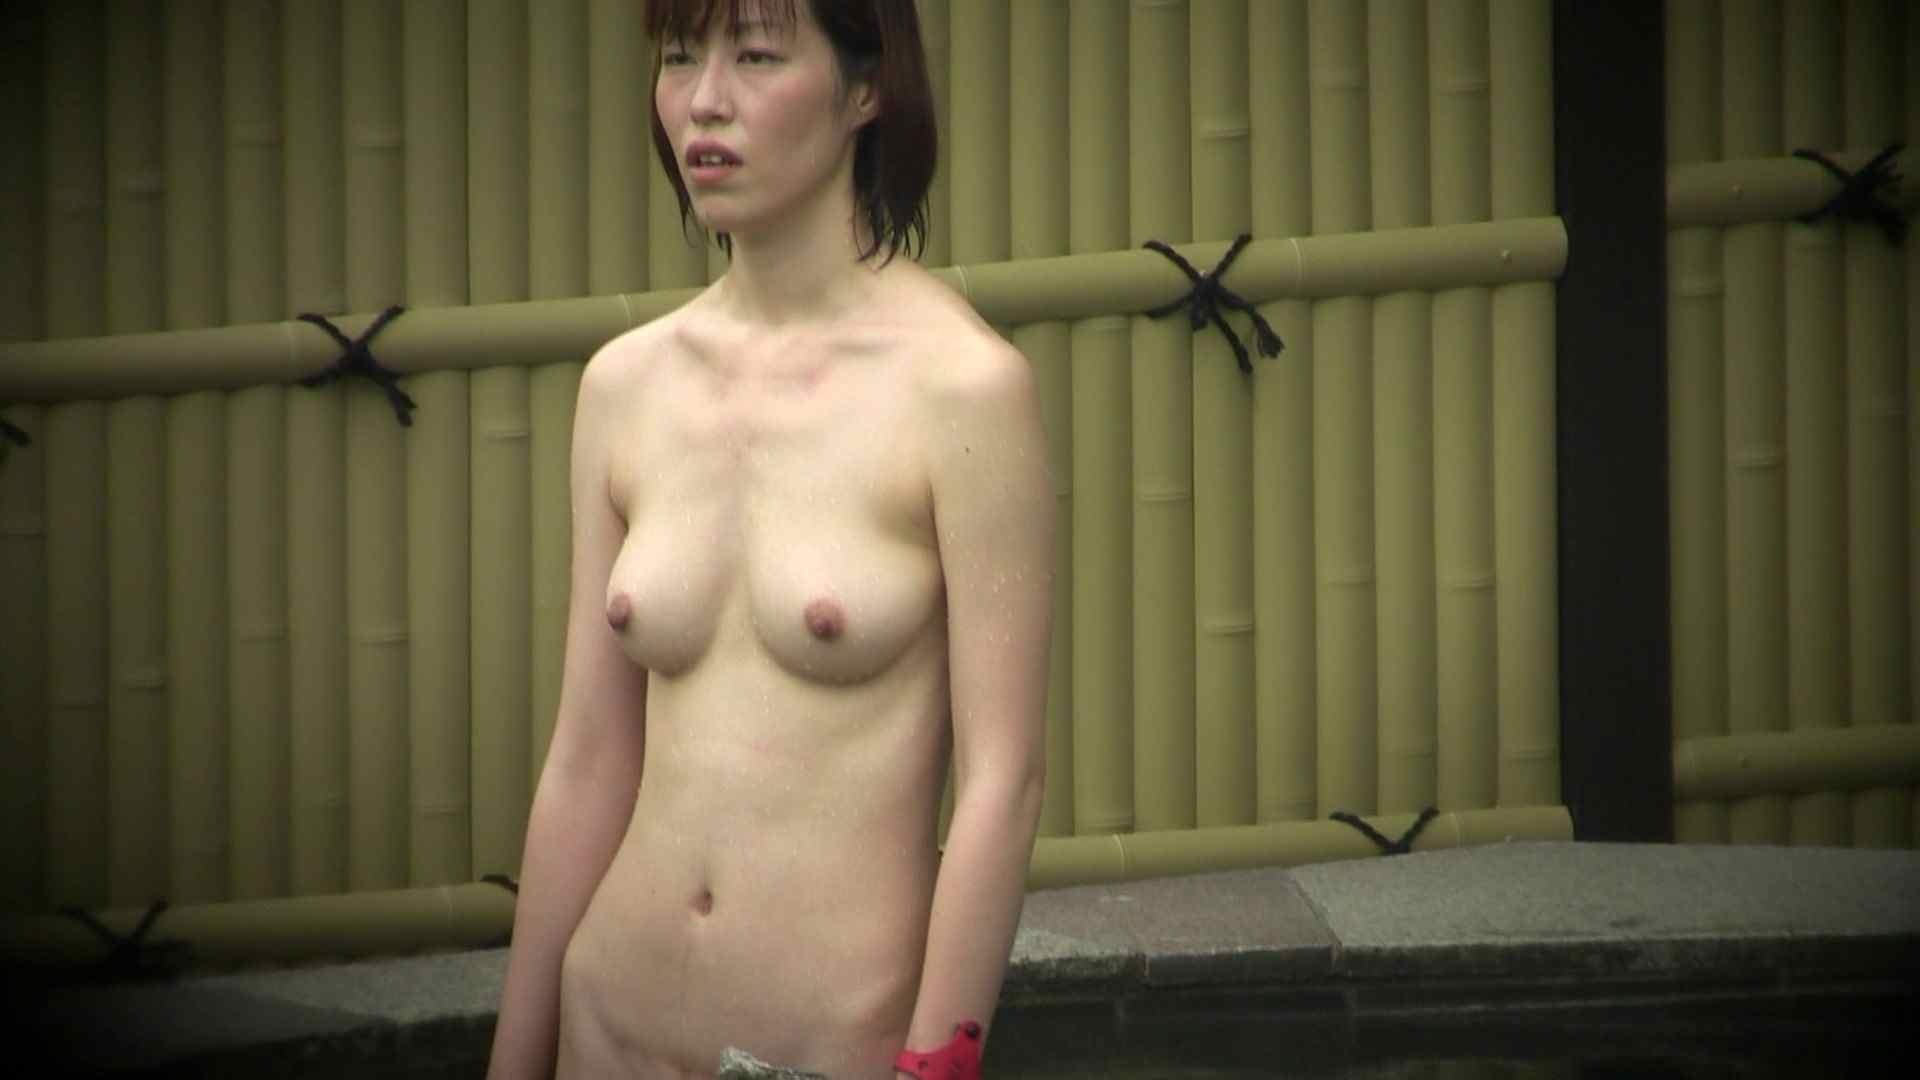 Aquaな露天風呂Vol.680 露天風呂編 | 盗撮シリーズ  106PIX 11